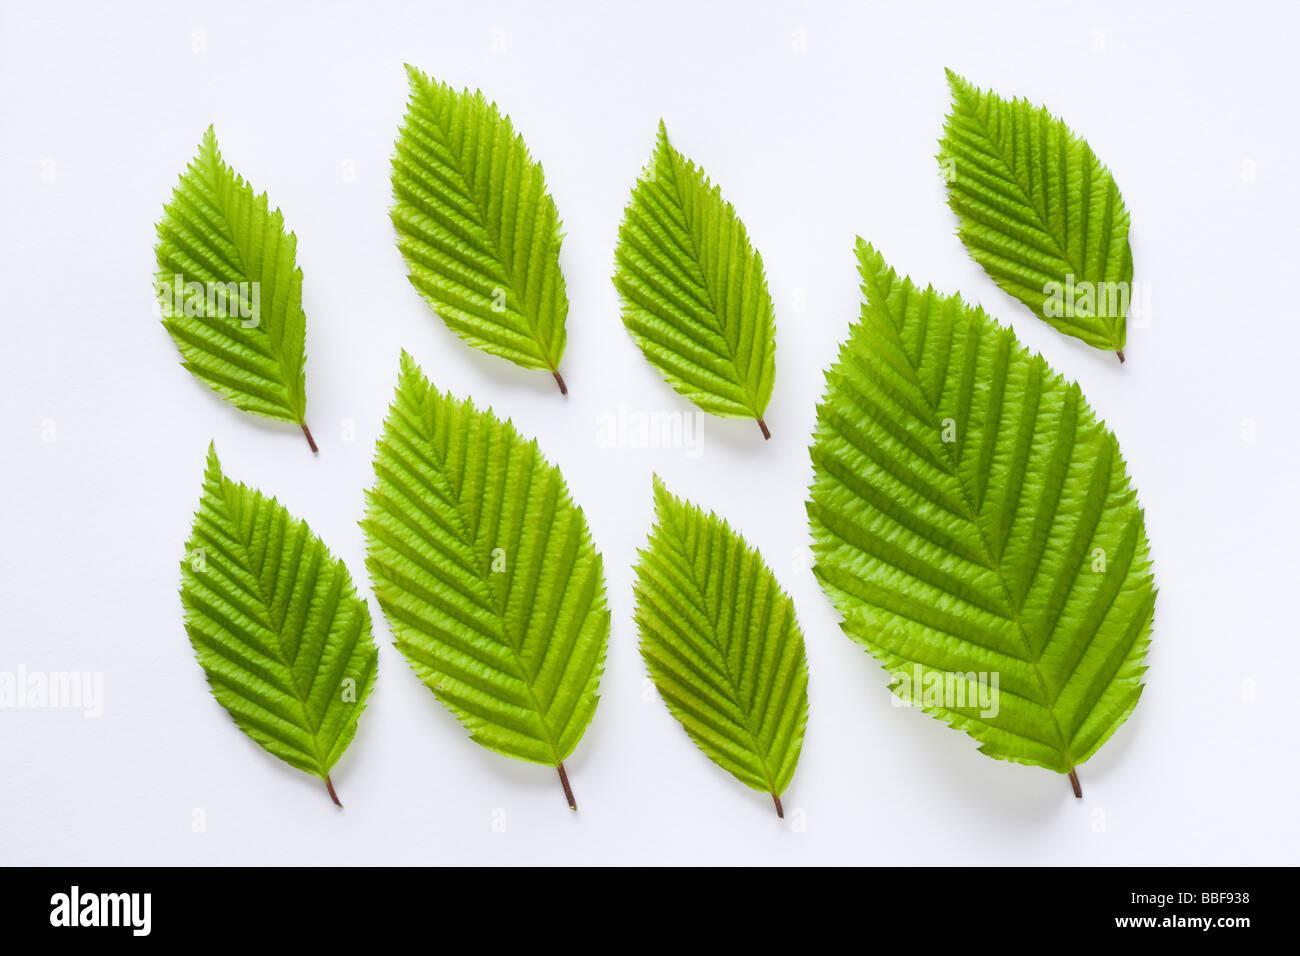 Hojas del árbol carpe, Carpinus betulus. Imagen De Stock